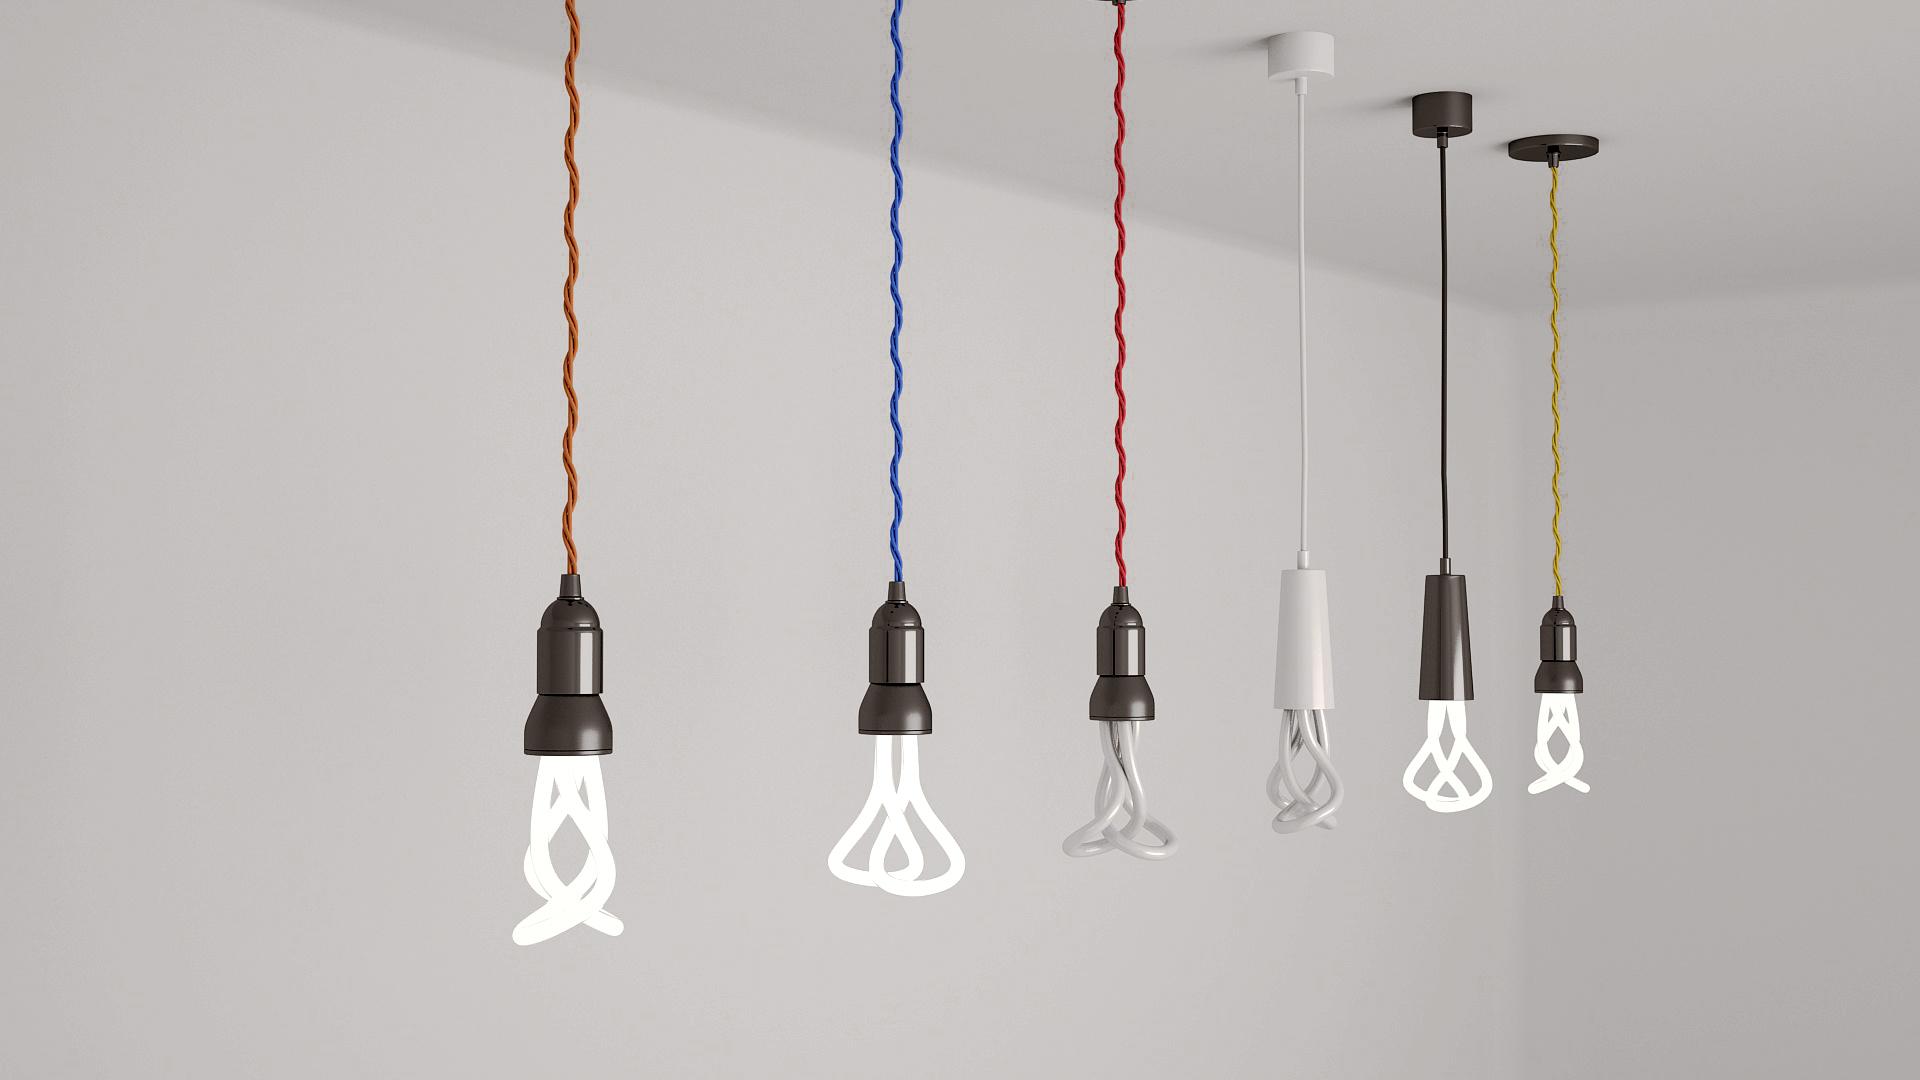 Plumen launches its new LED bulb